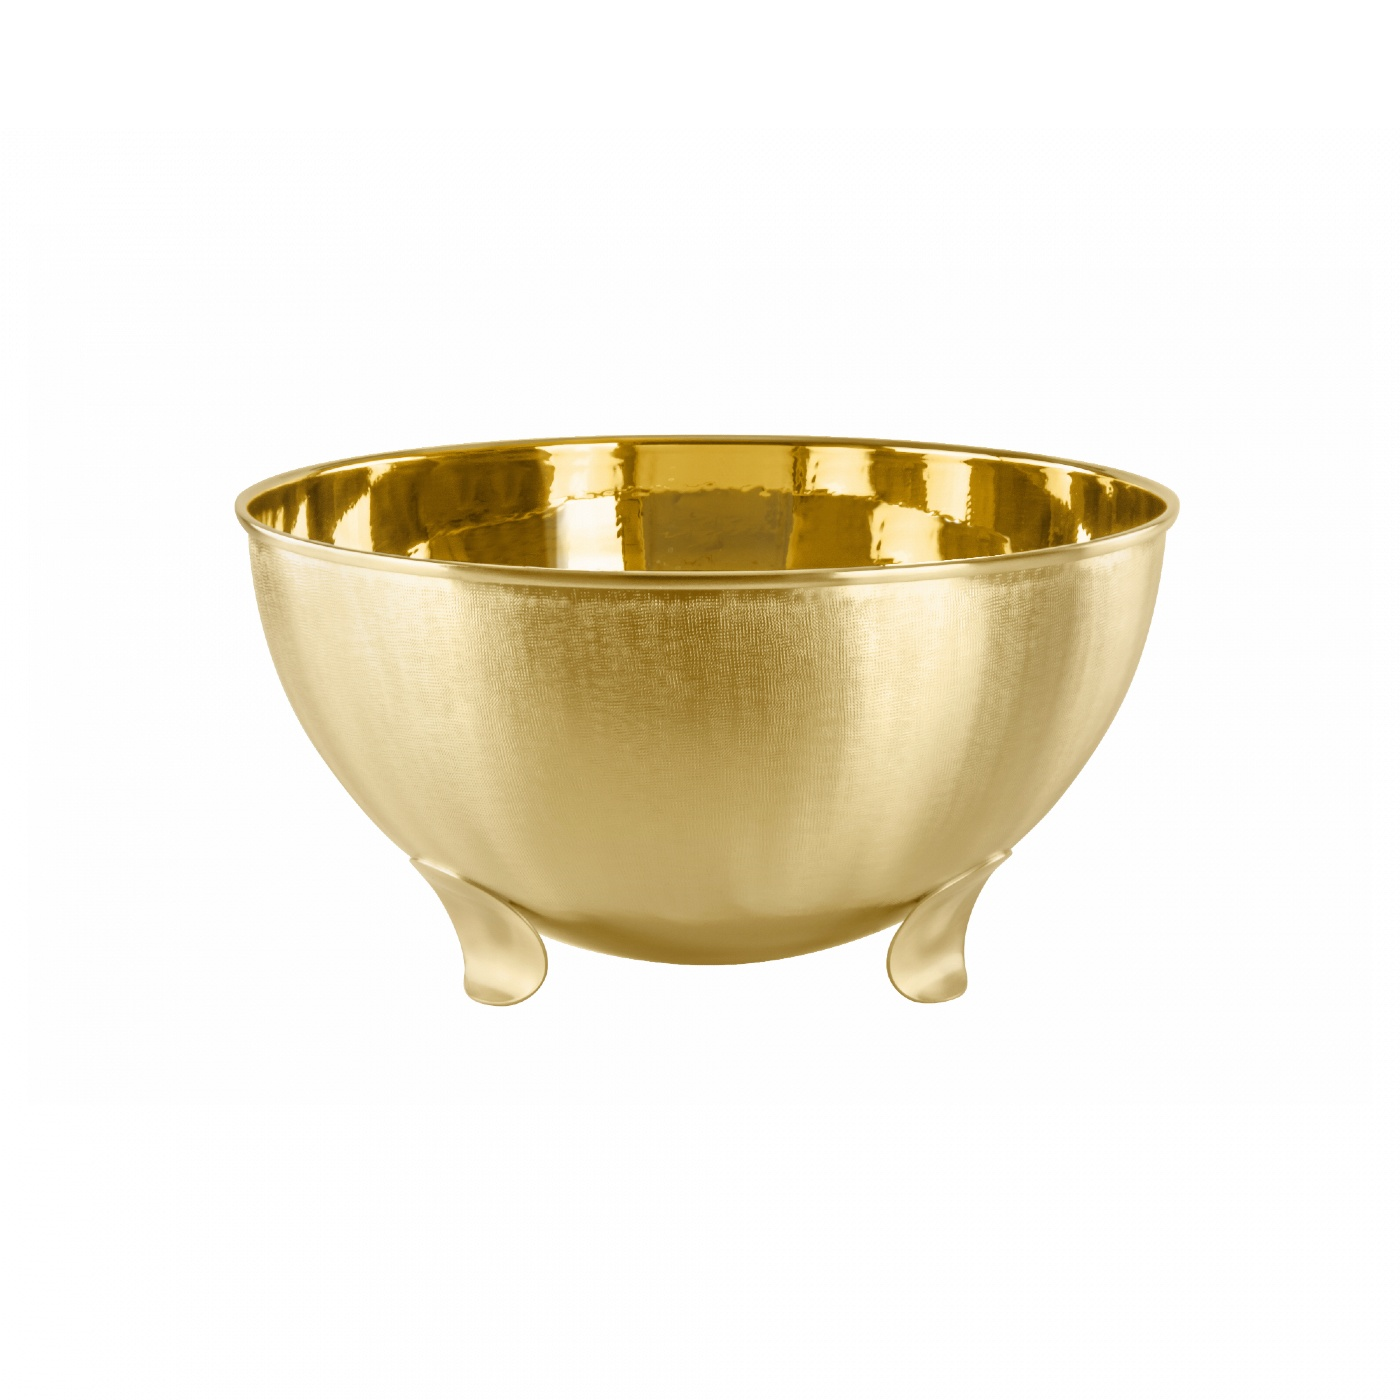 centrotavola-champagnera-velvet-1-collection-zanetto-1